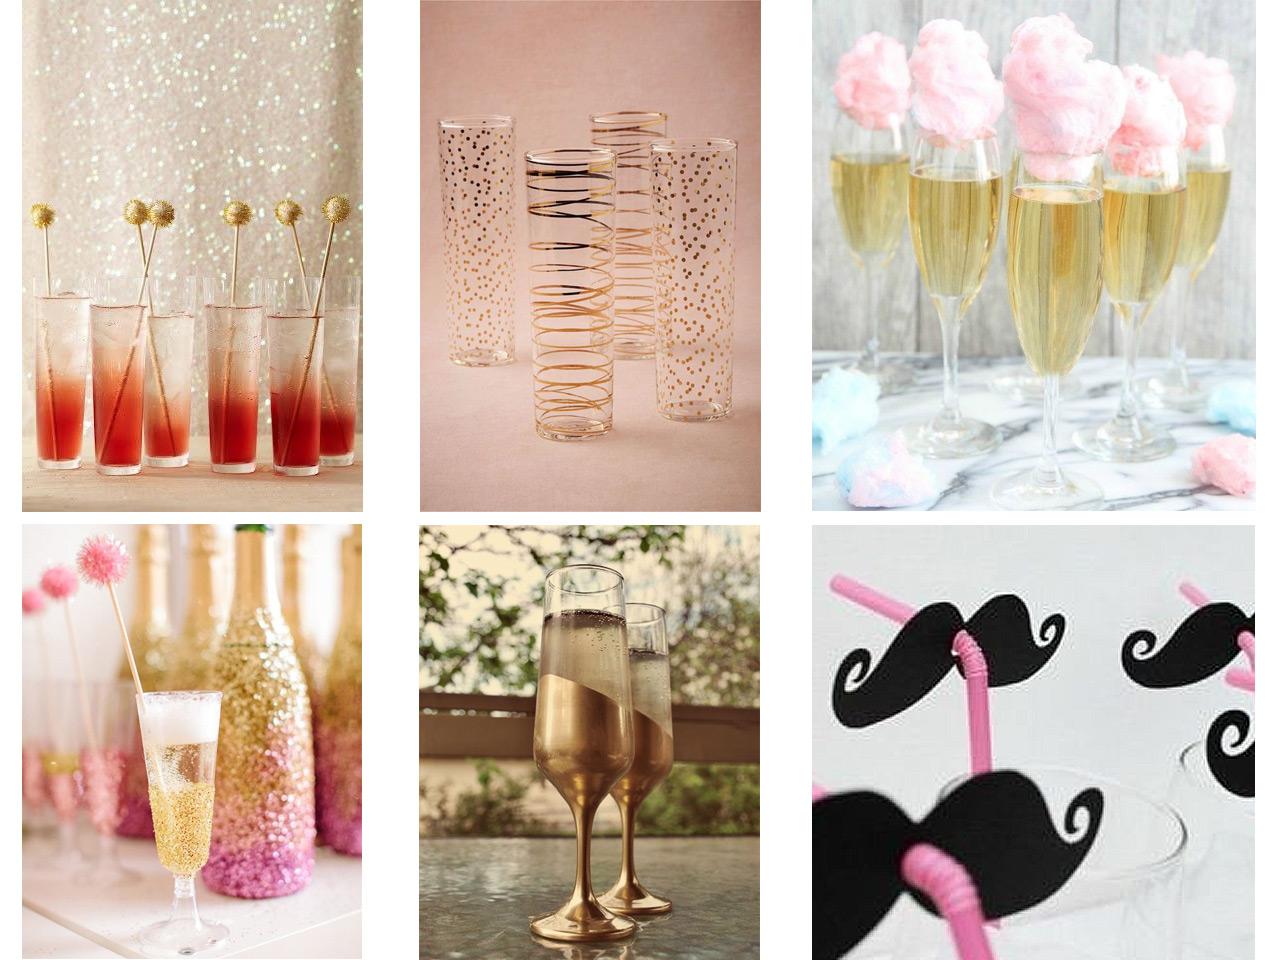 Triunfa con estos tips para decorar tu fiesta de nochevieja - Postres faciles para nochevieja ...